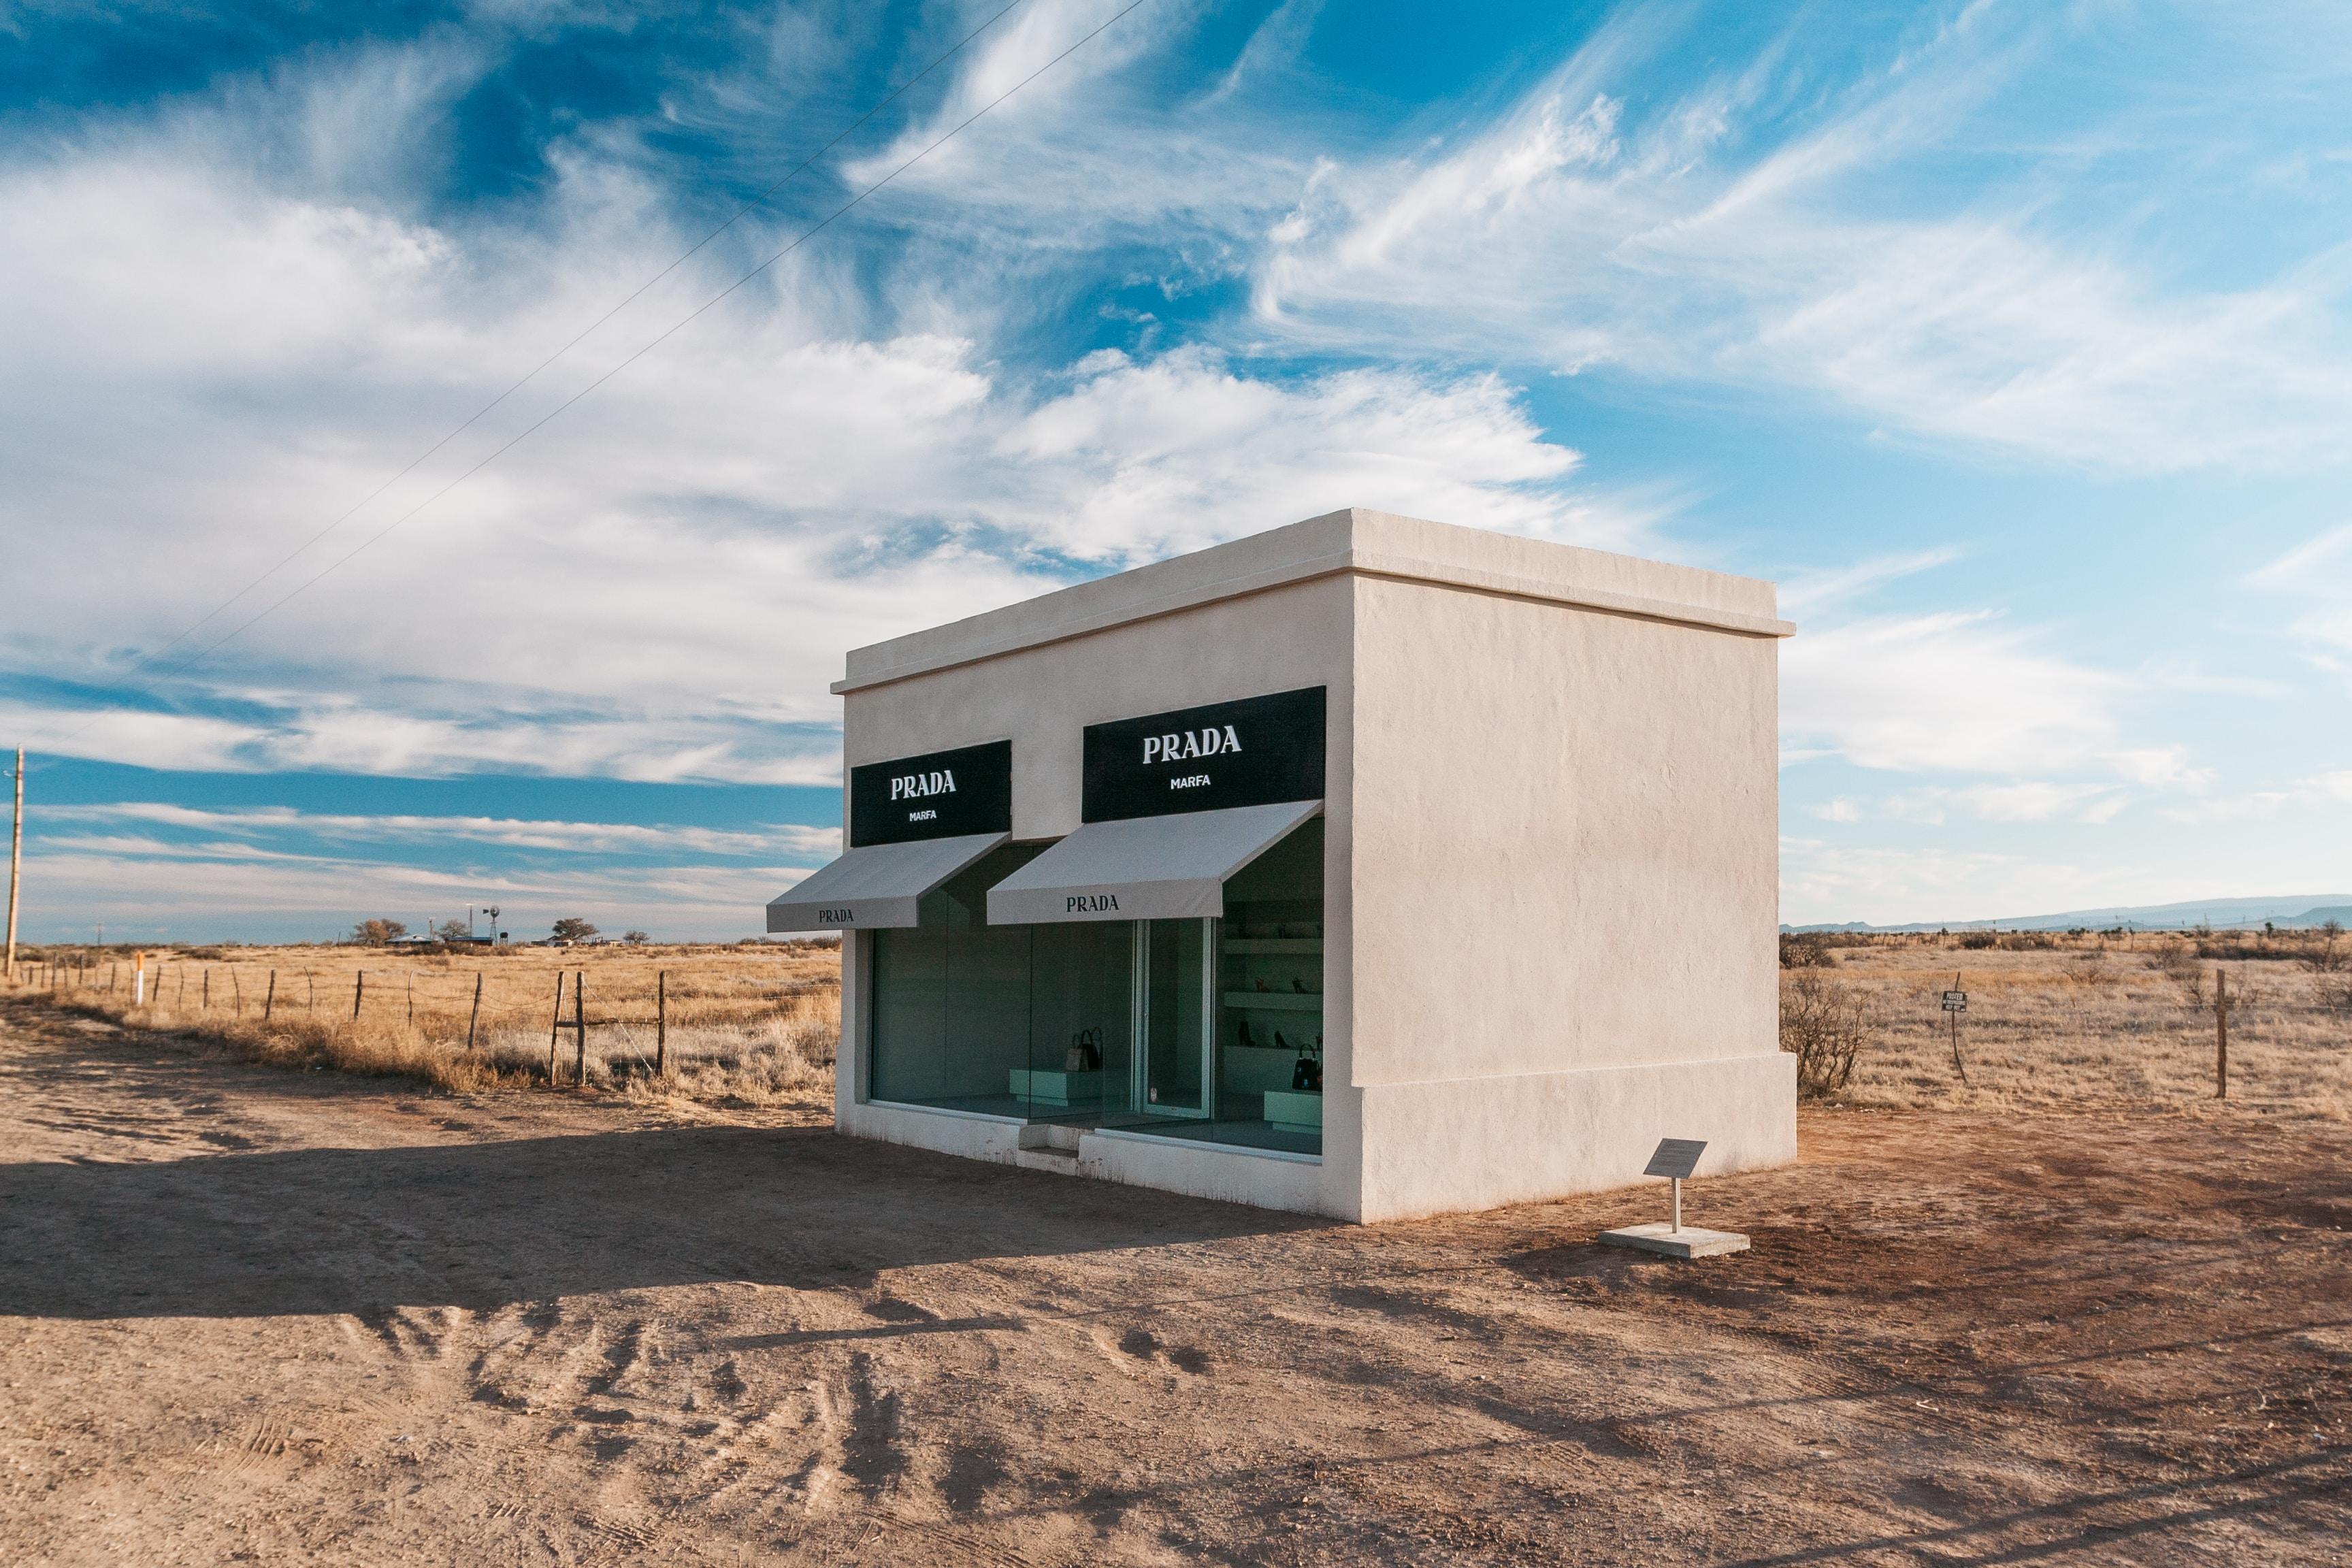 beige Prada concrete store in the middle of desert